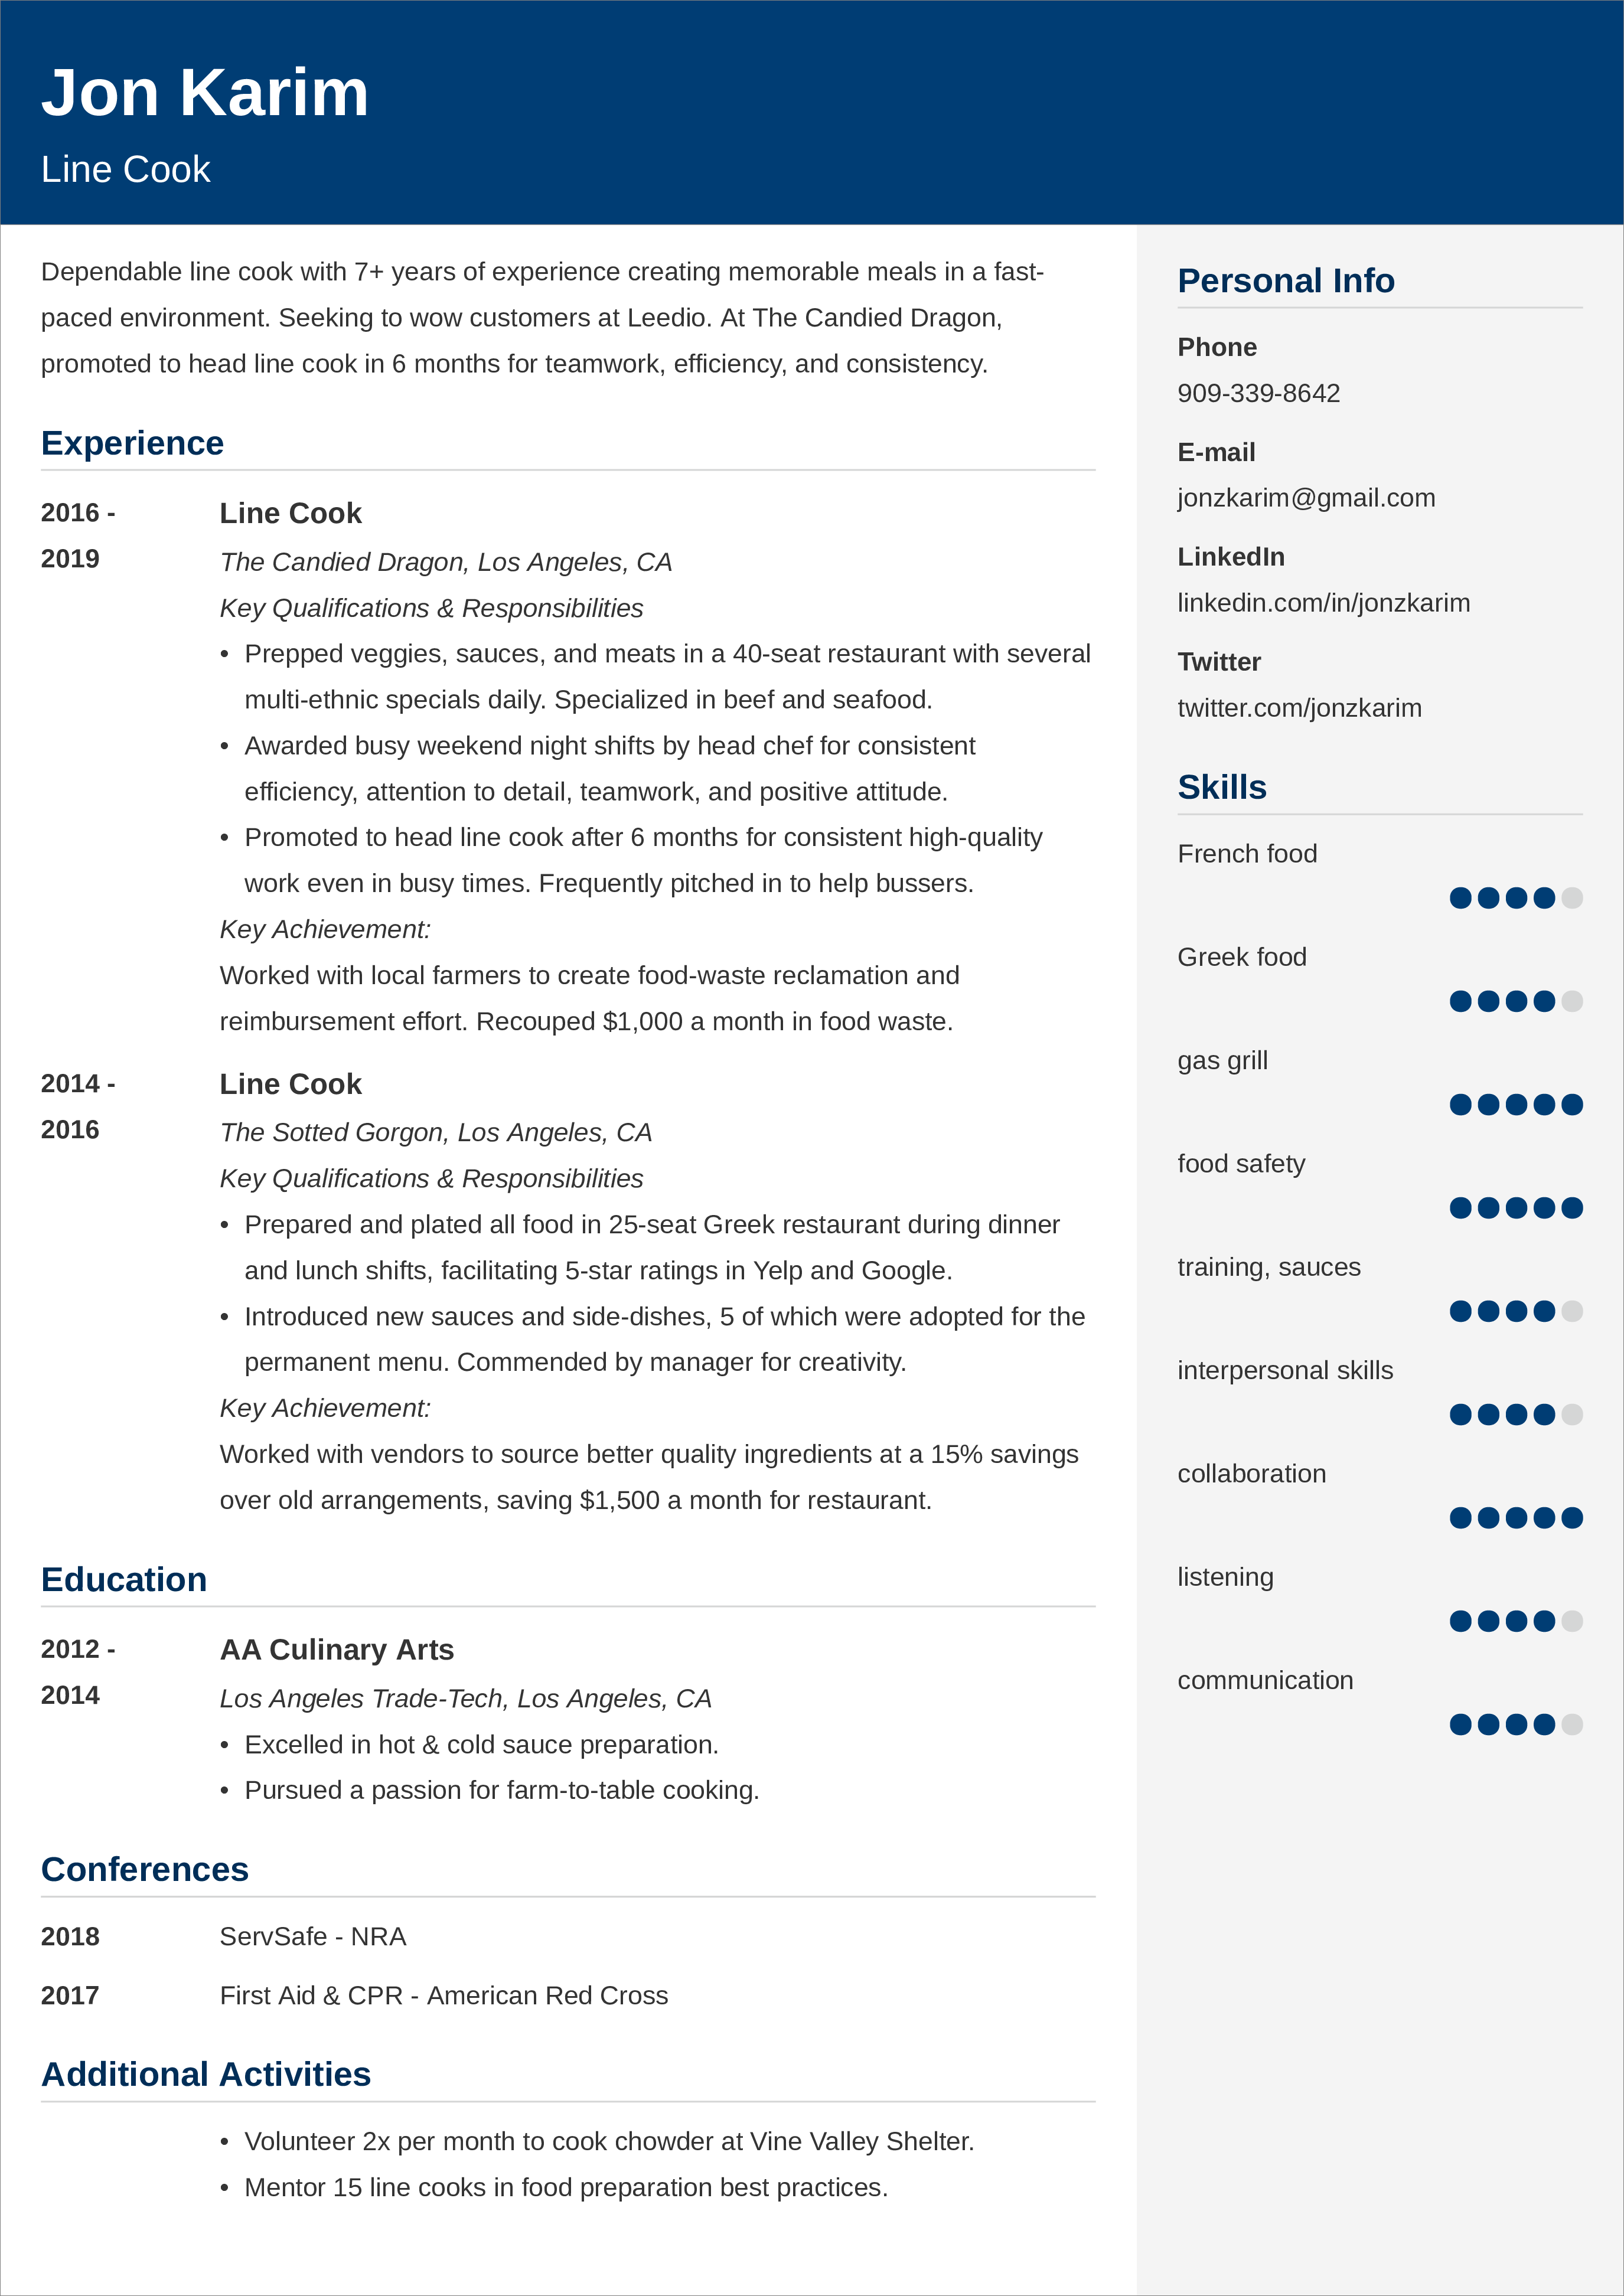 line cook CV templates